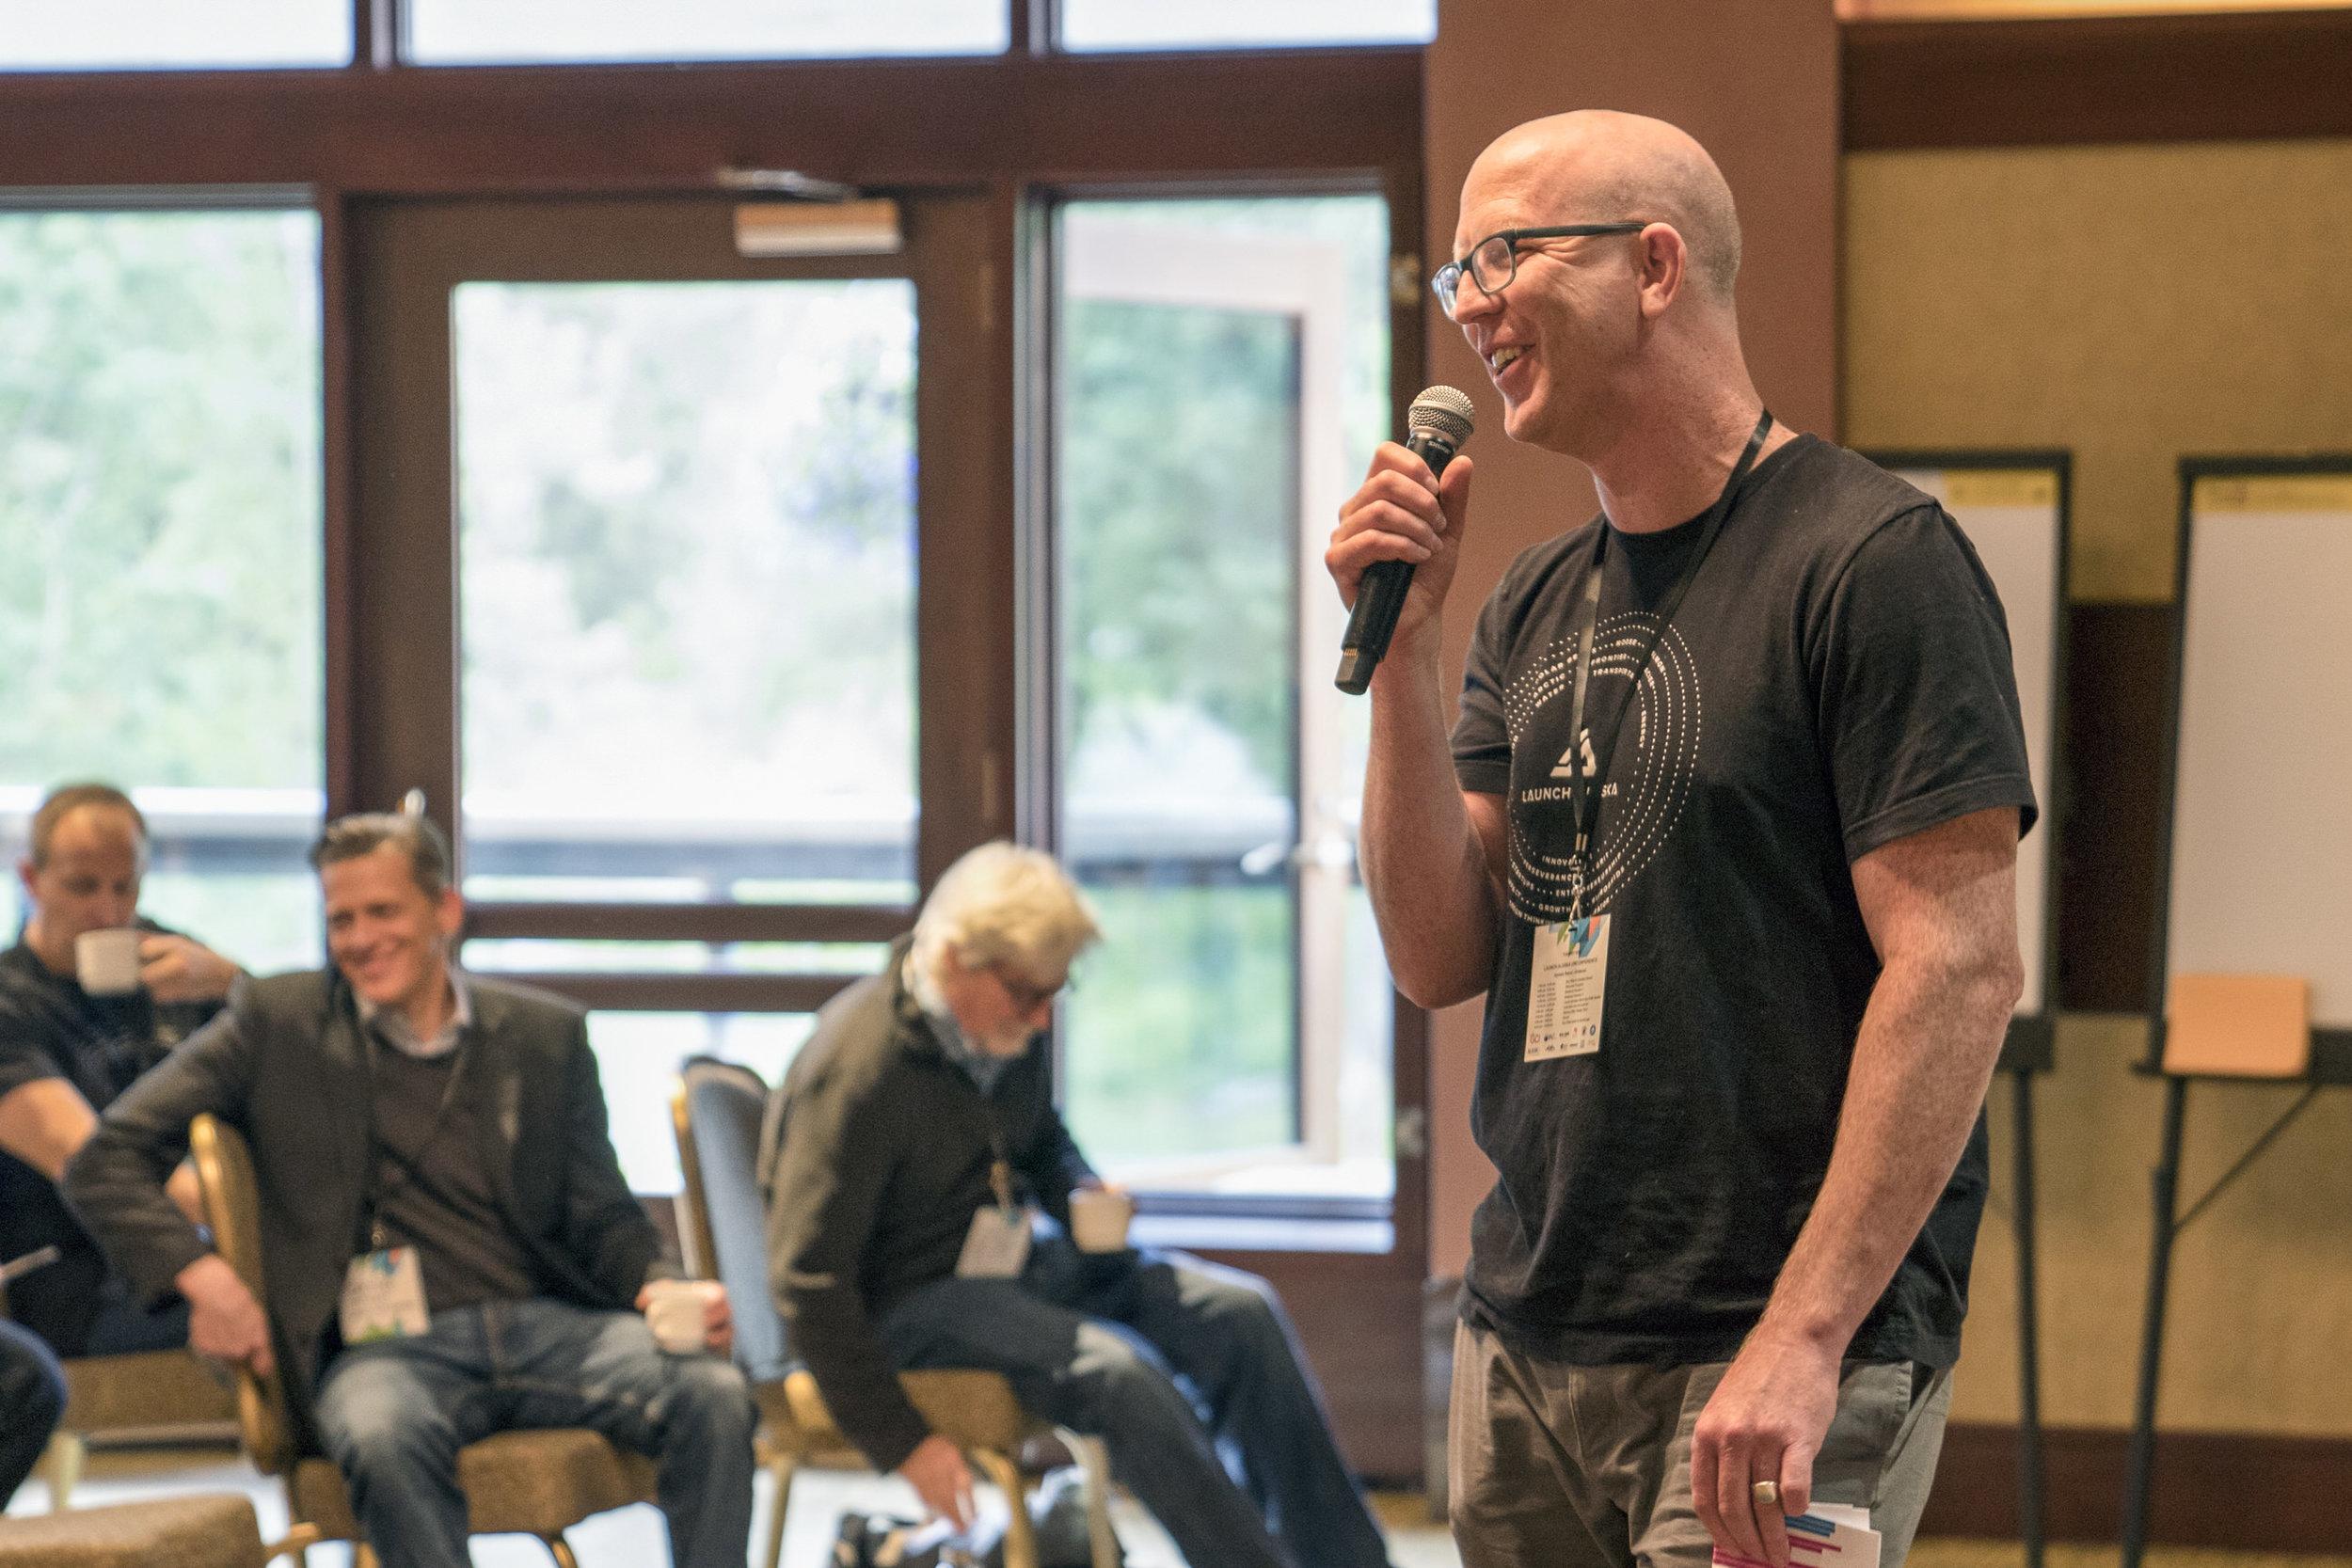 Isaac Vanderburg, managing director of Launch Alaska, speaks at the Energize Alaska Summit in Girdwood in 2018. (Photo courtesy of Launch Alaska)